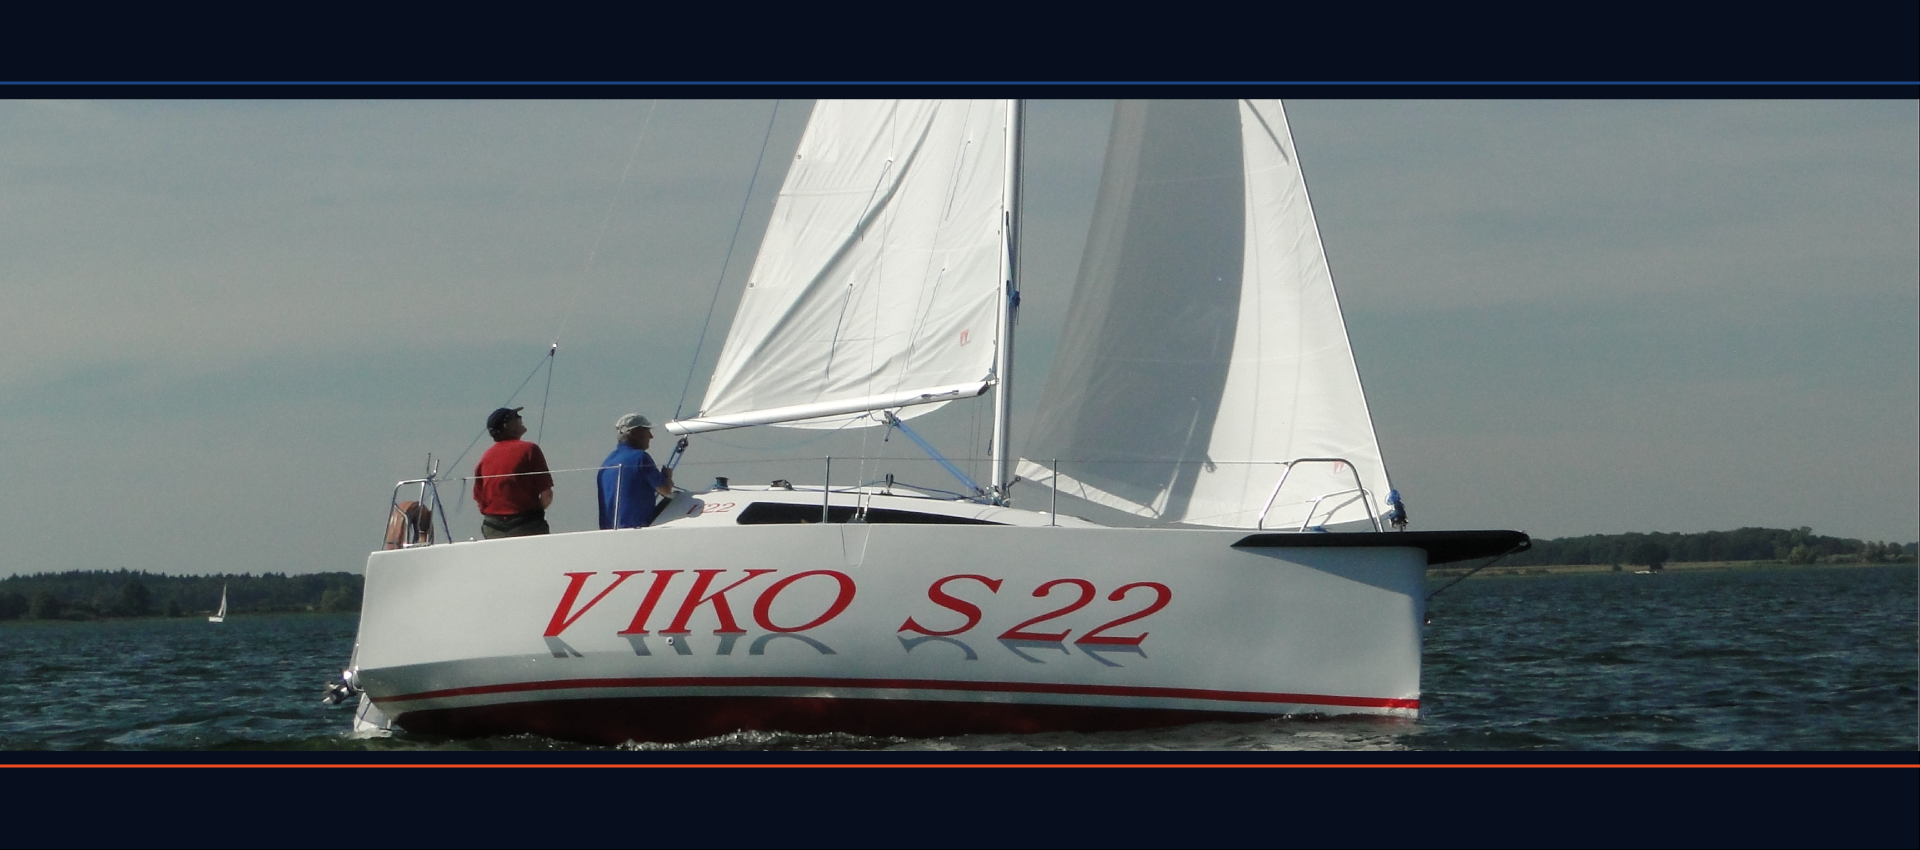 Viko yachts-VikoS-22-seilbåt